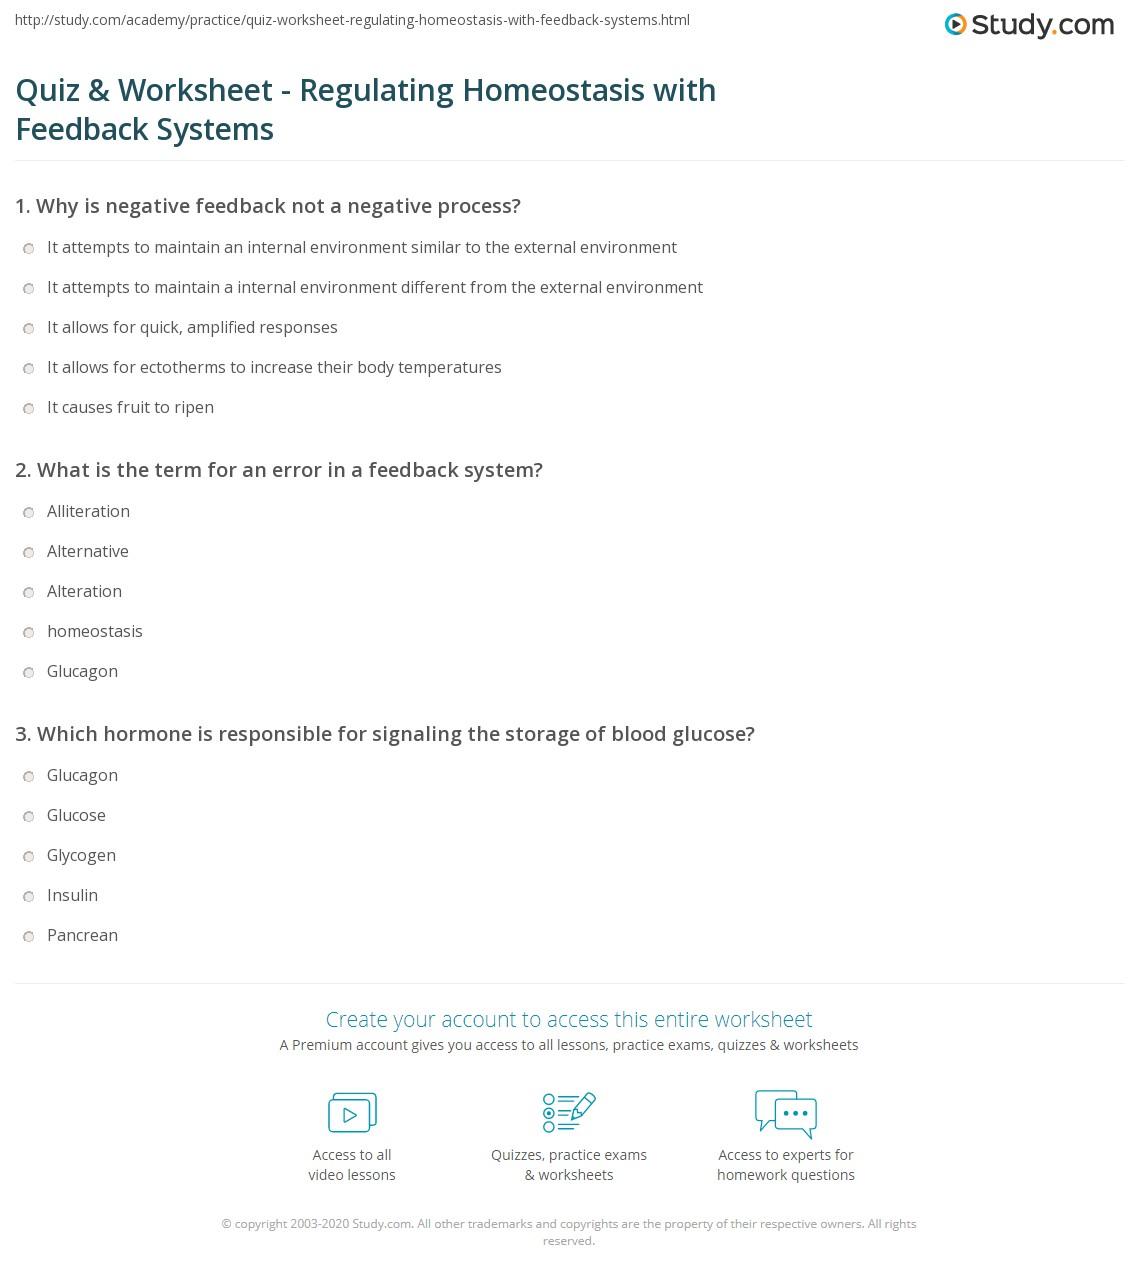 Quiz Worksheet Regulating Homeostasis With Feedback